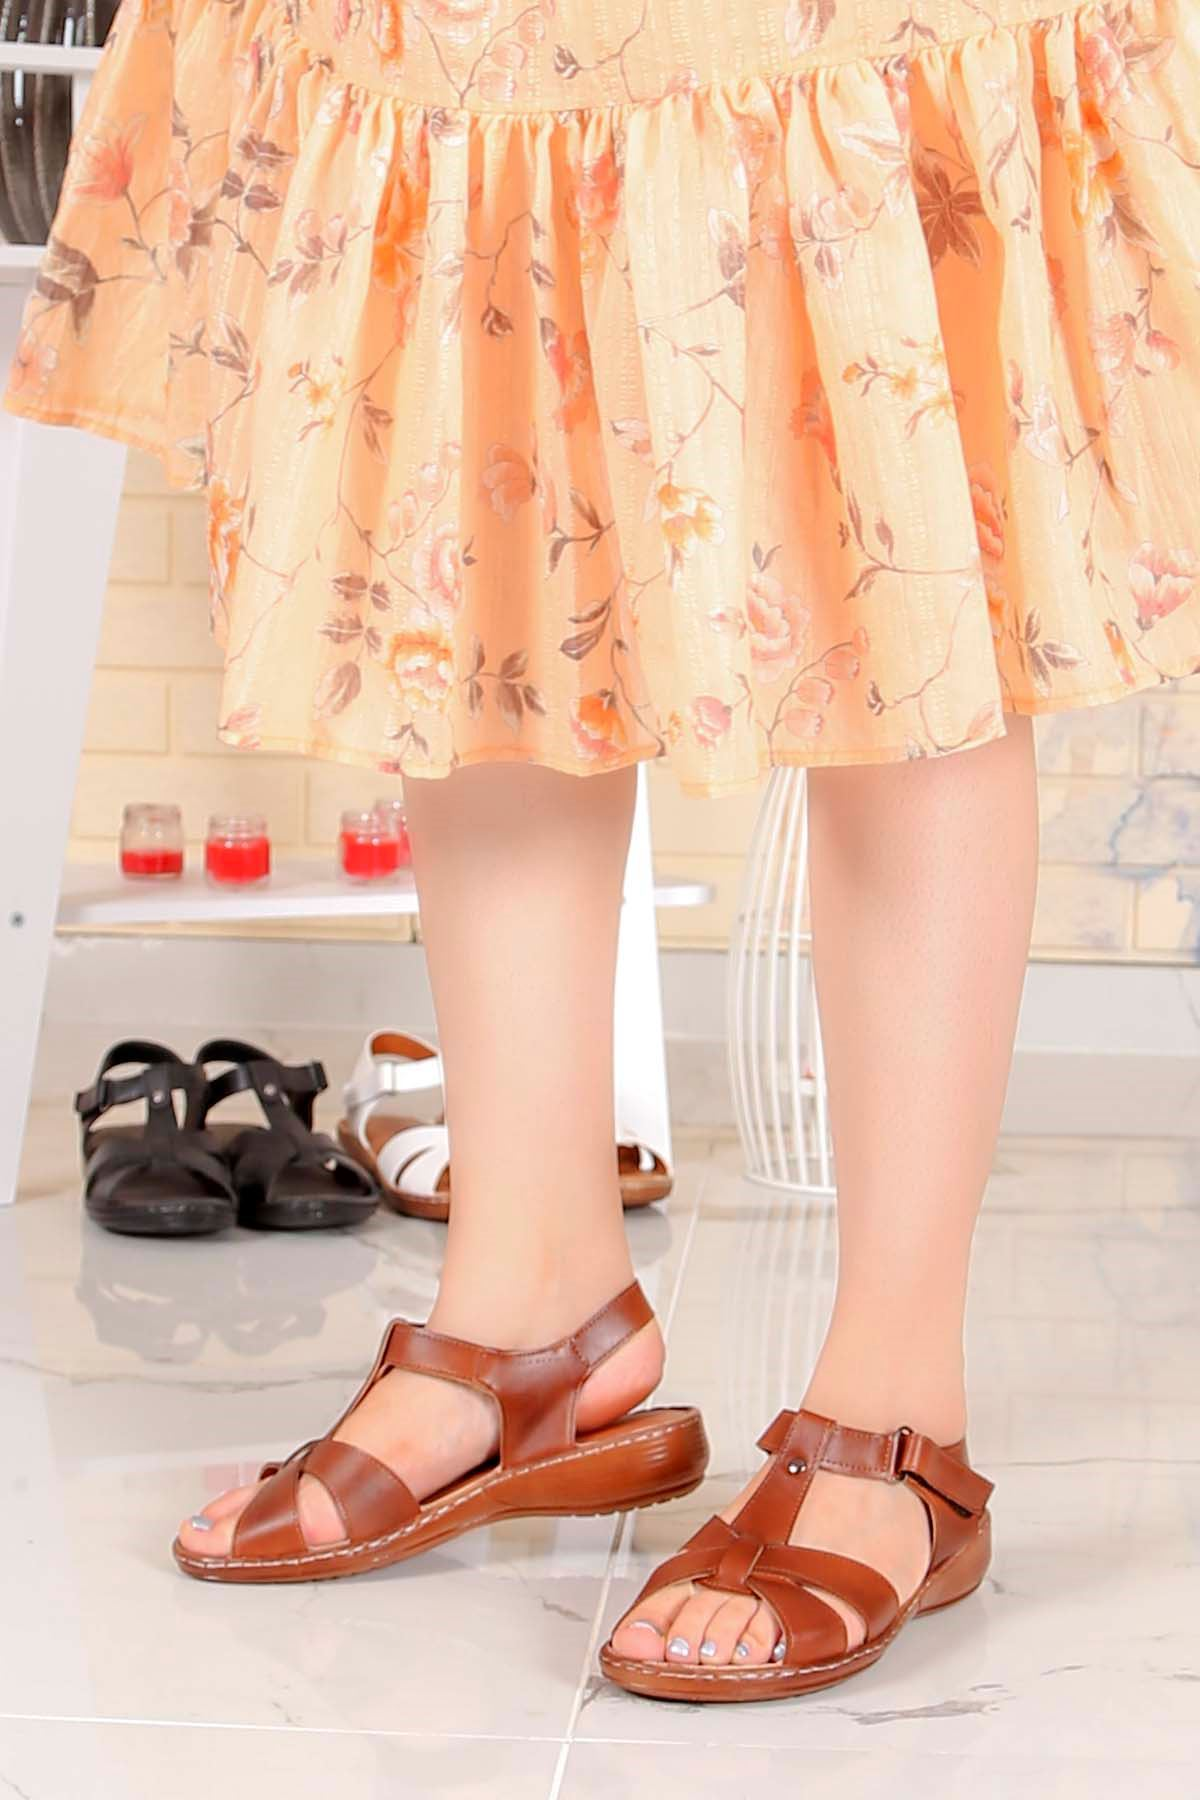 My-Fit-701 Konfor Sandalet Taba Deri